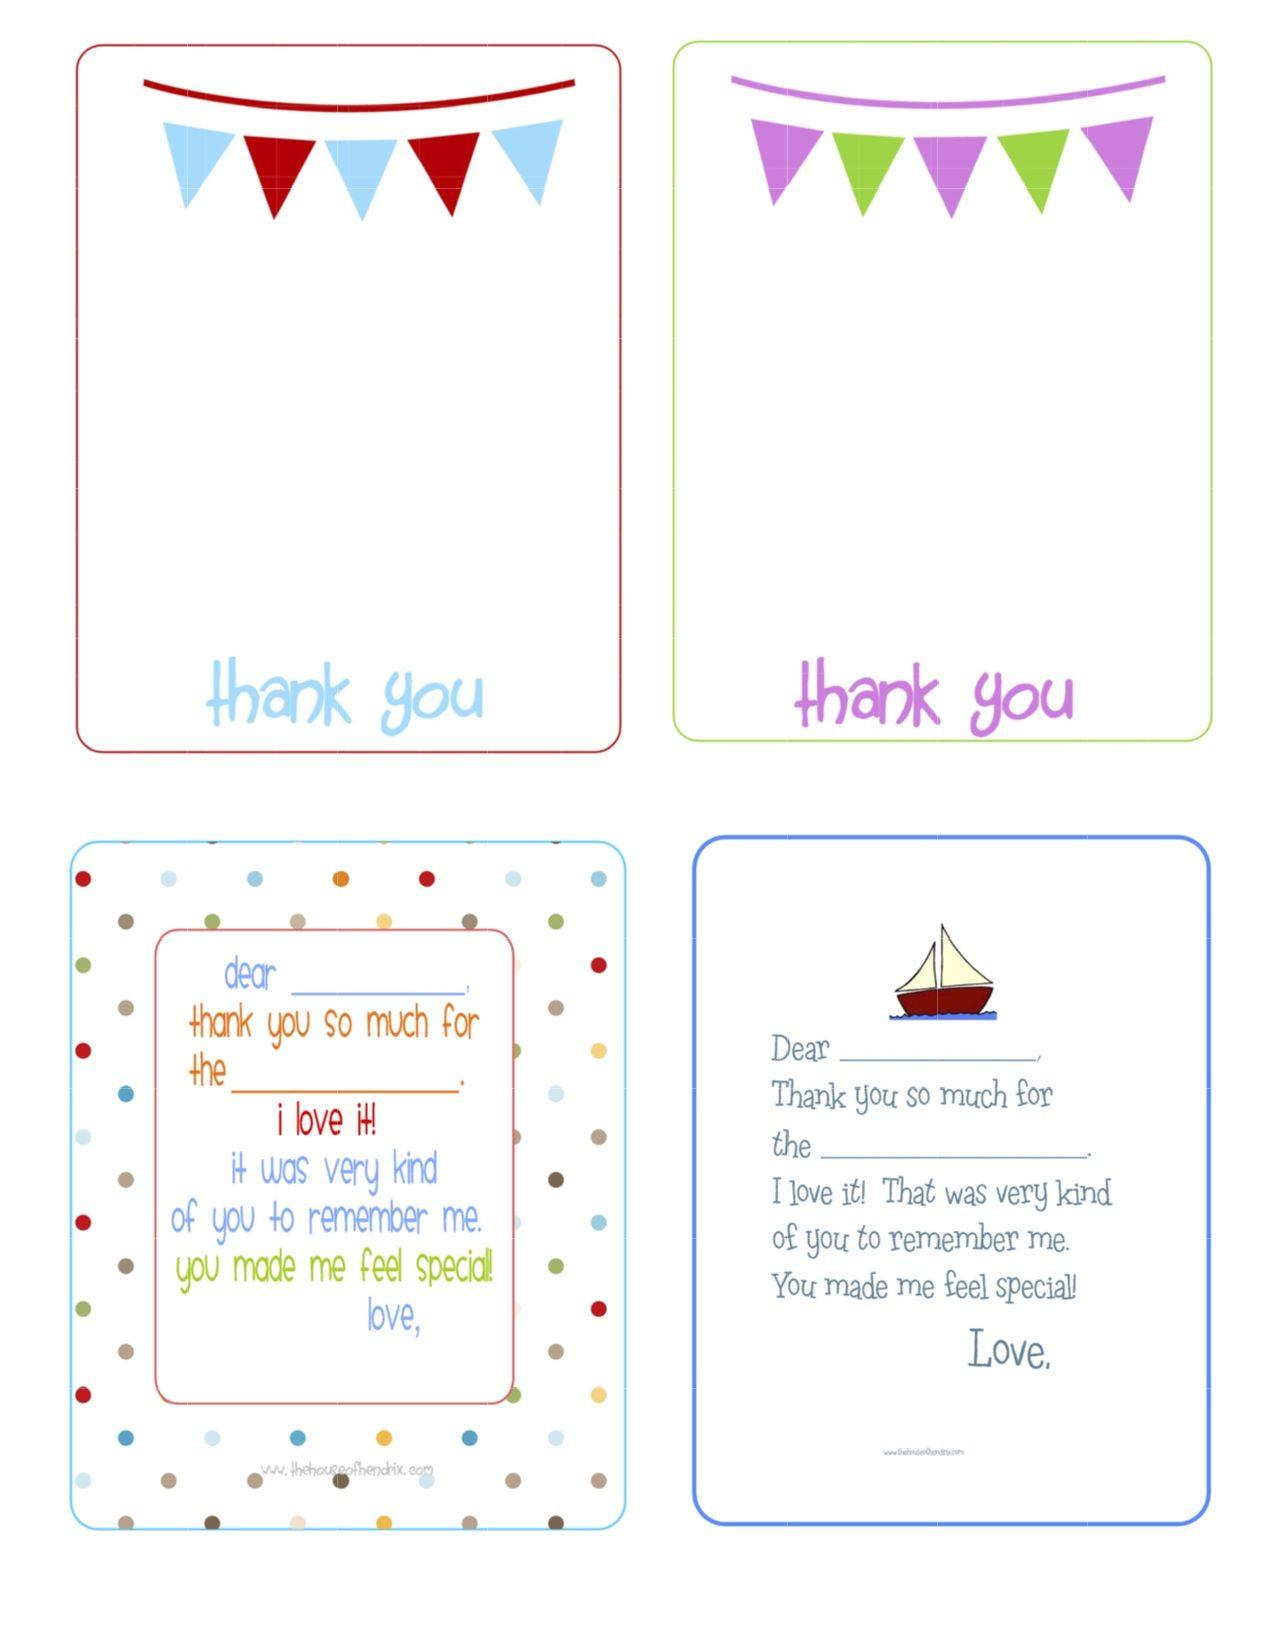 Printable Birthday Thank You Cards - | Printables & Fonts - Free Printable Thank You Notes